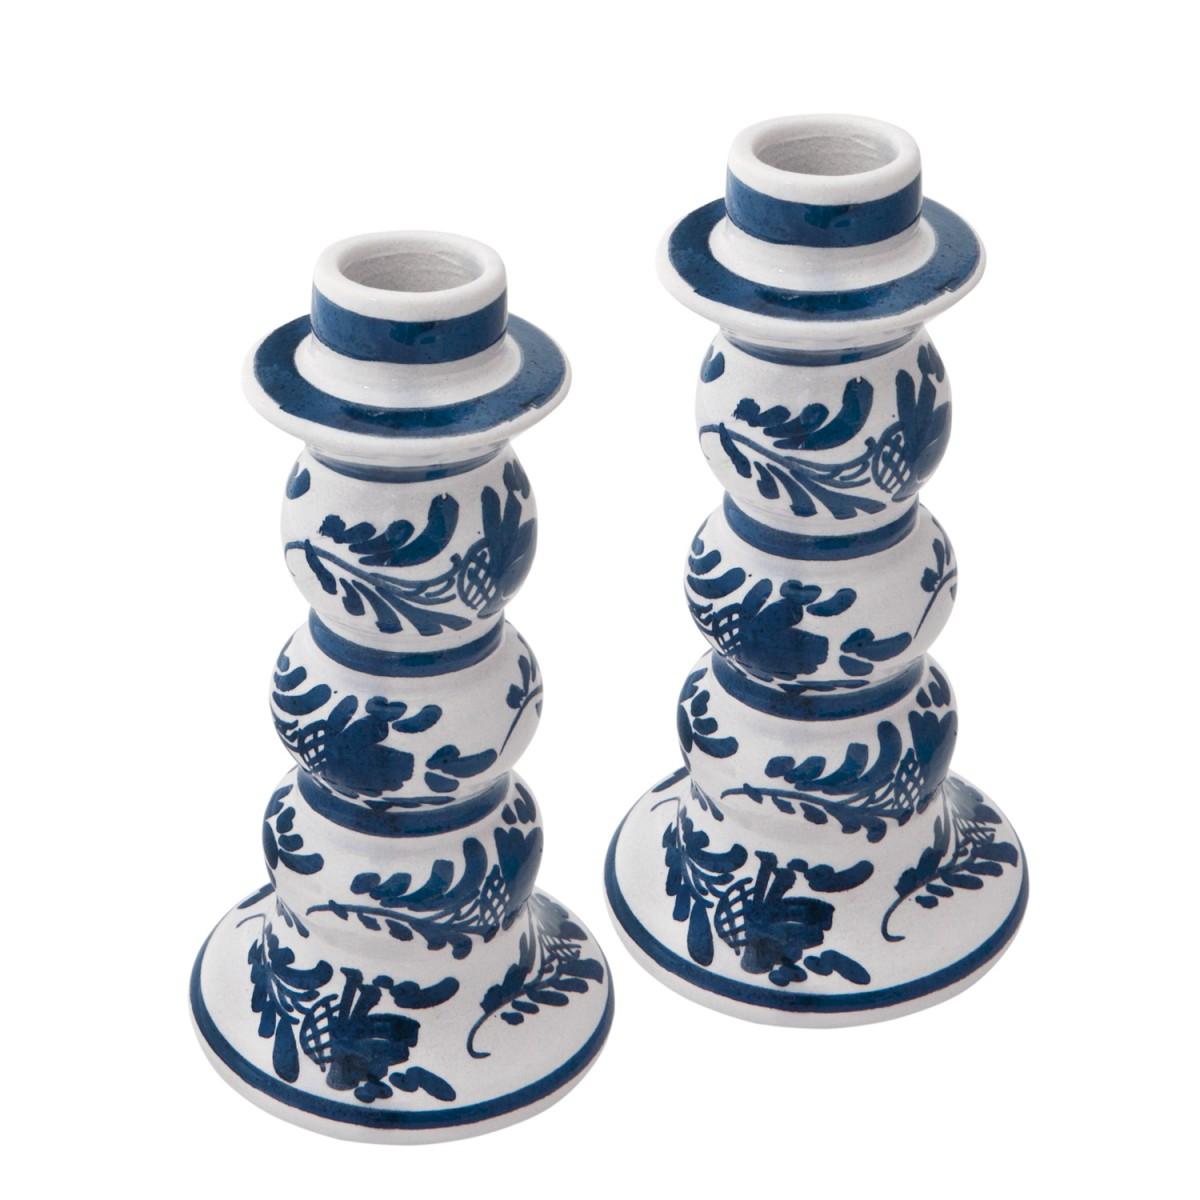 ft_handmade_ceramic_candle-holders_skyriana-blue-and-white-3-30-00166.jpg